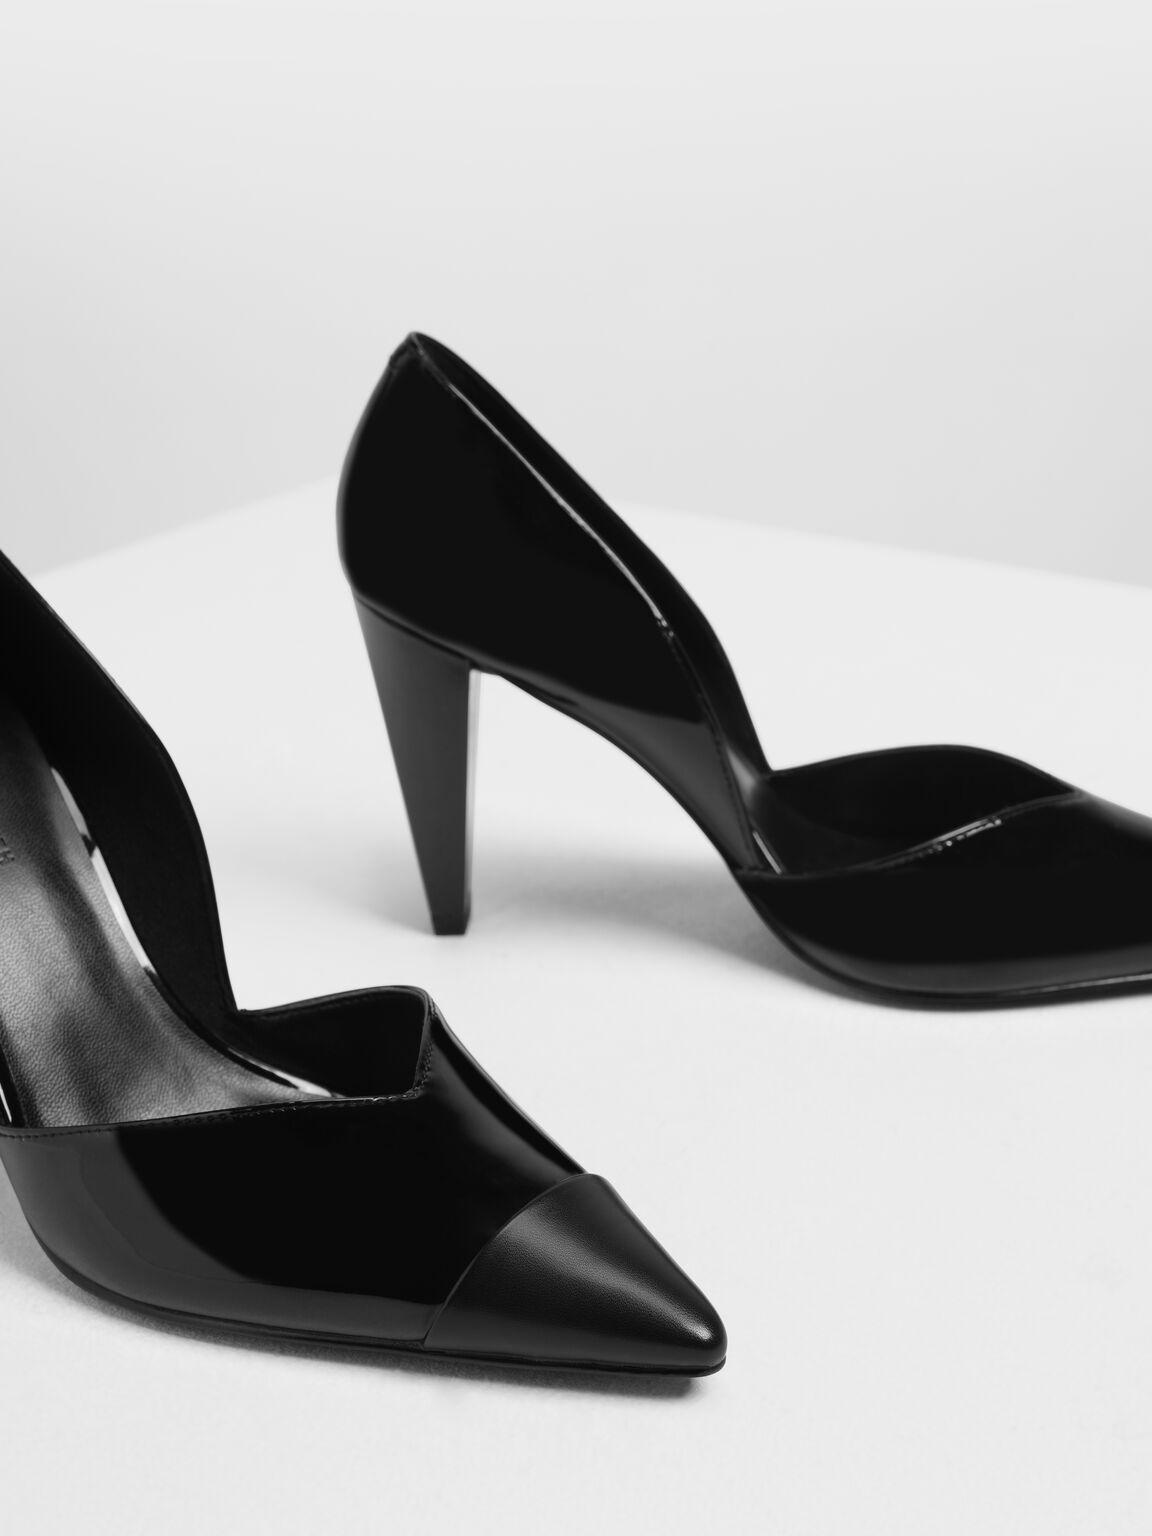 Pointed Toe D'Orsay Pumps, Black, hi-res